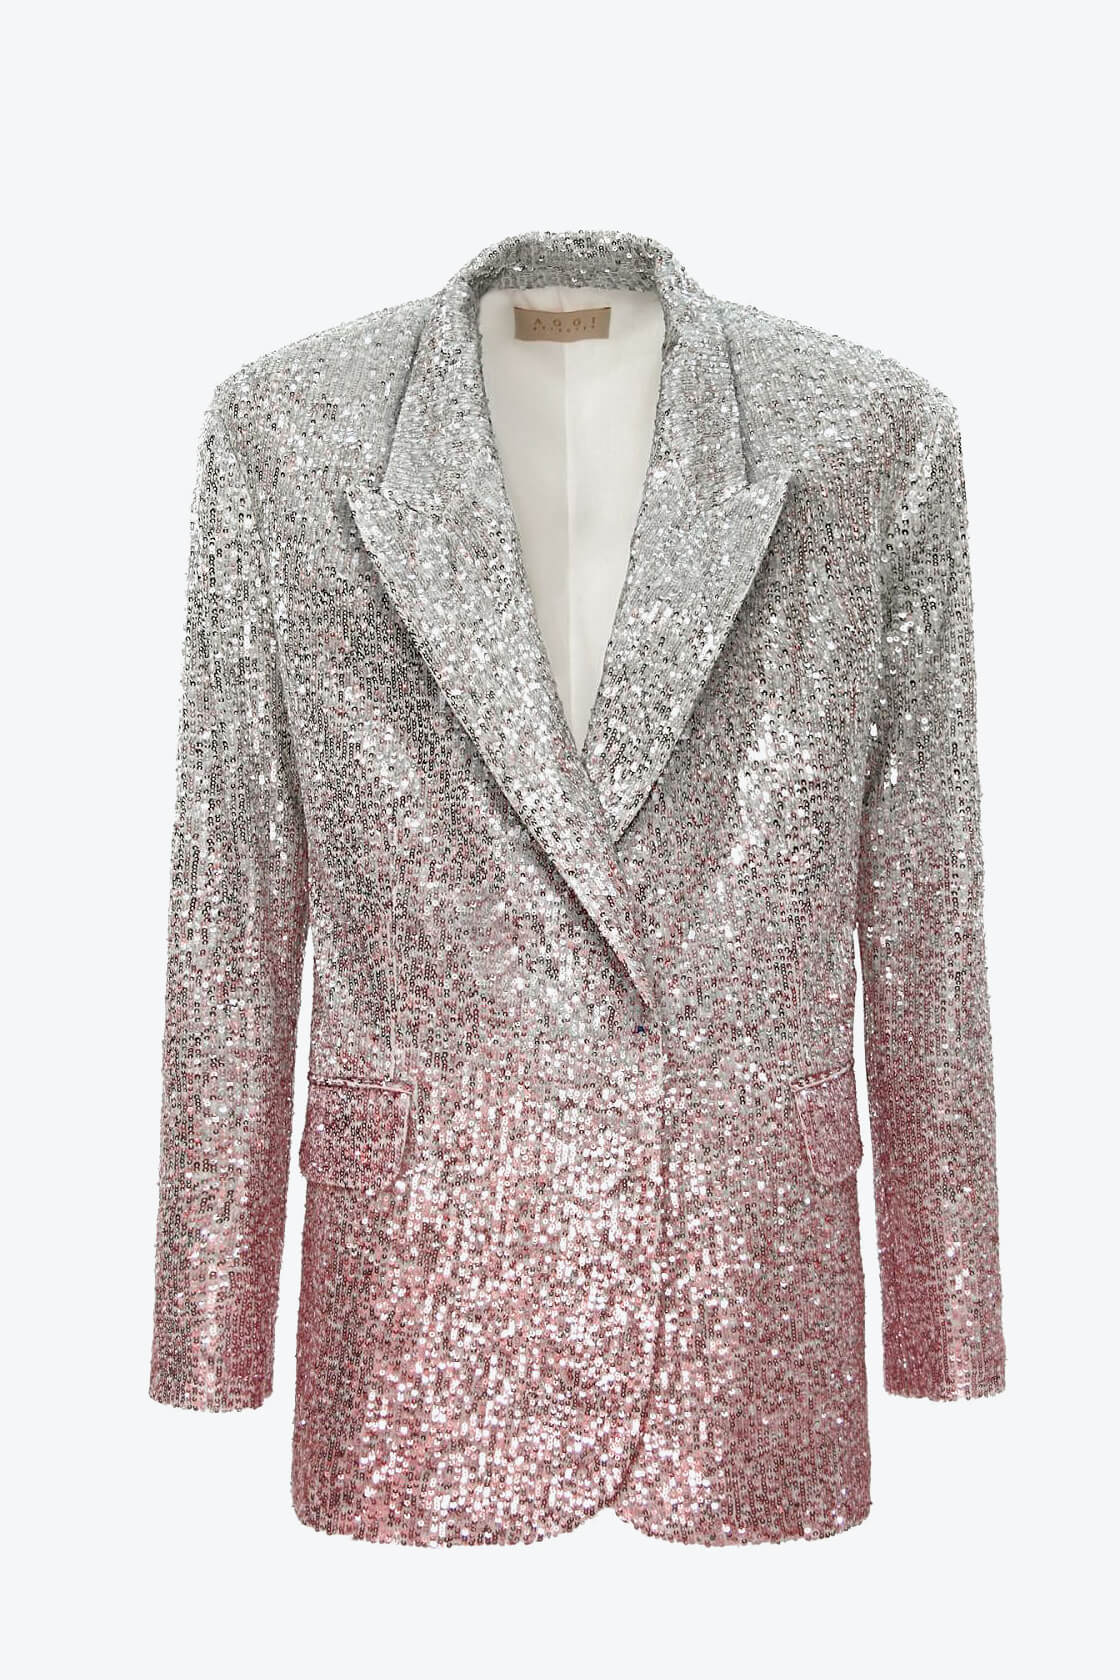 OL100002570 Sequin Blazer Gioia Silver Peony1